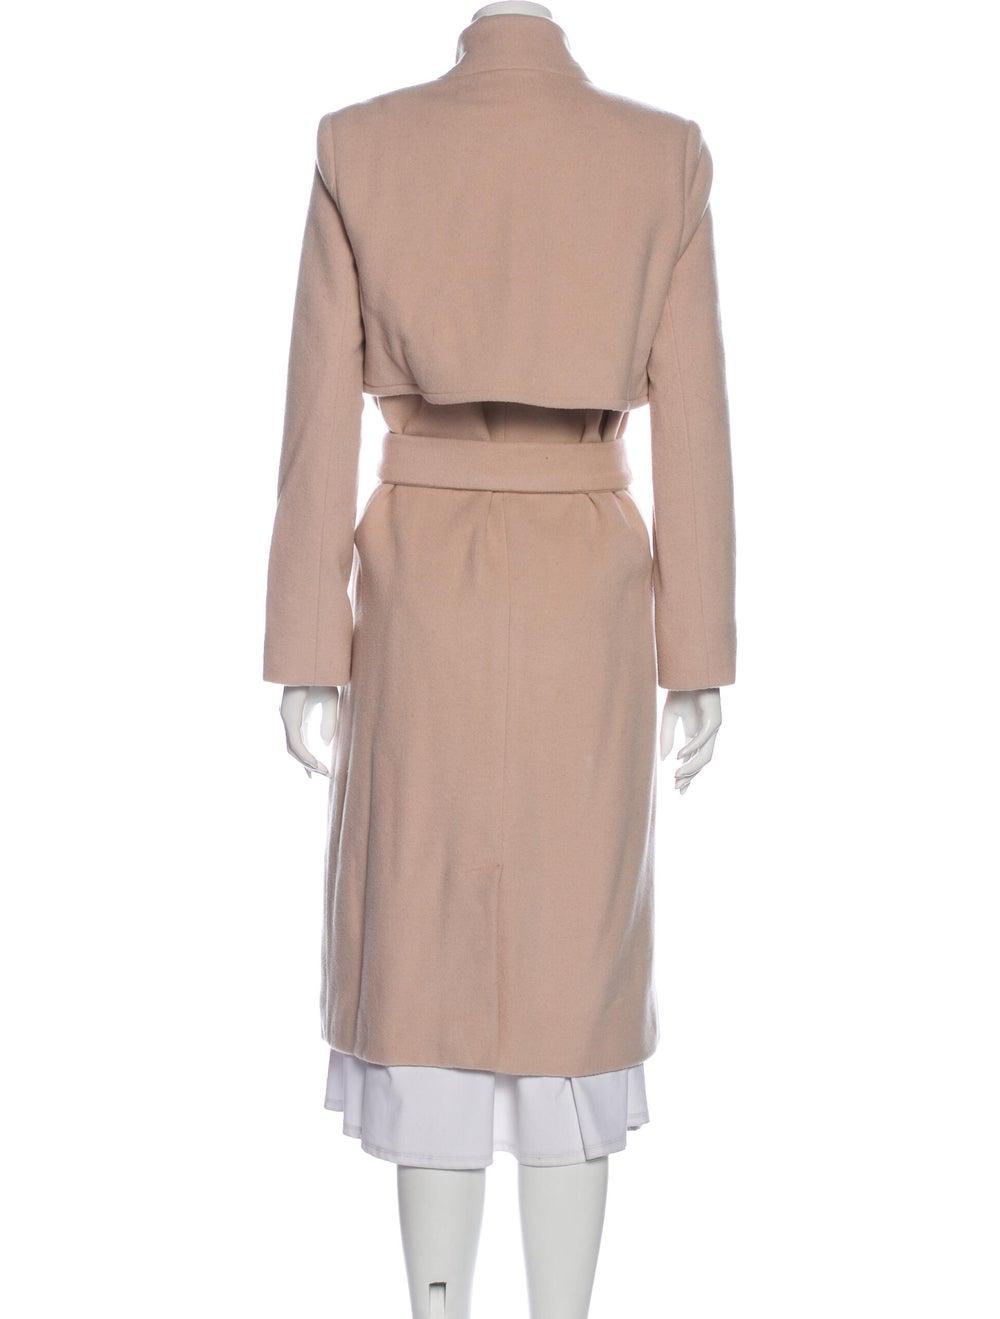 Halston Heritage Trench Coat Pink - image 3